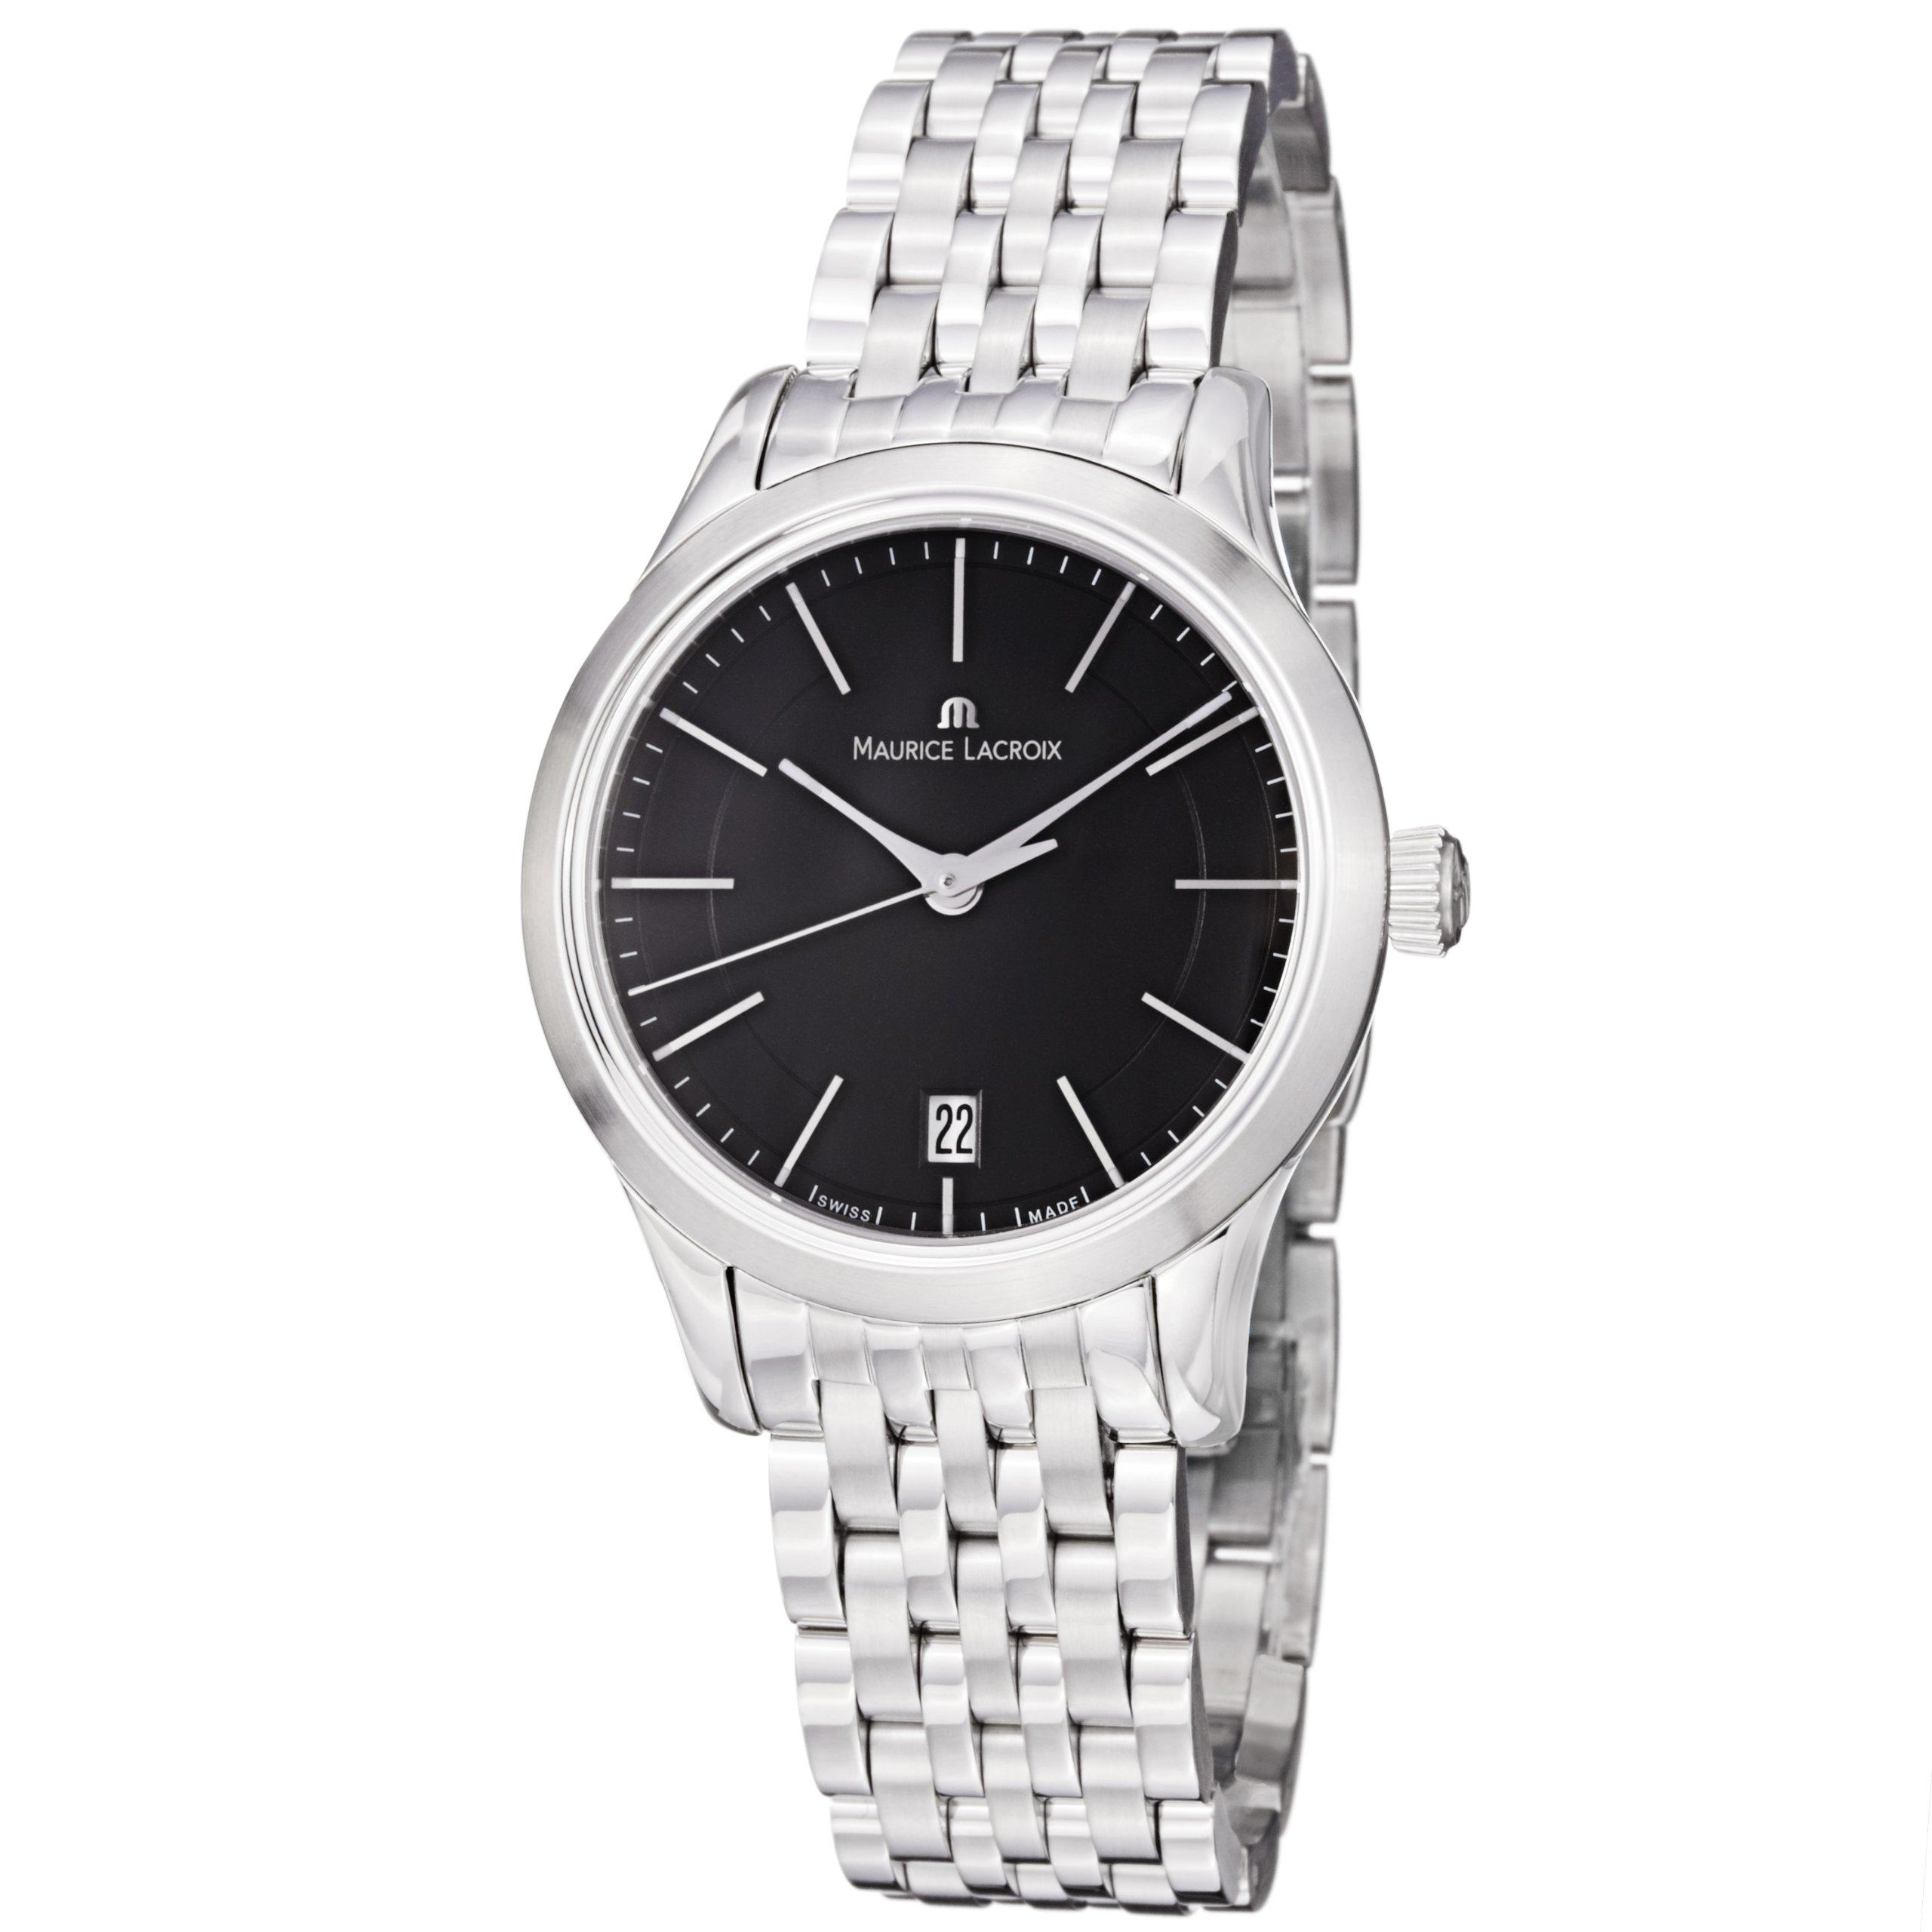 Maurice Lacroix Quarzuhren  - -Armbanduhr- LC1026-SS002330